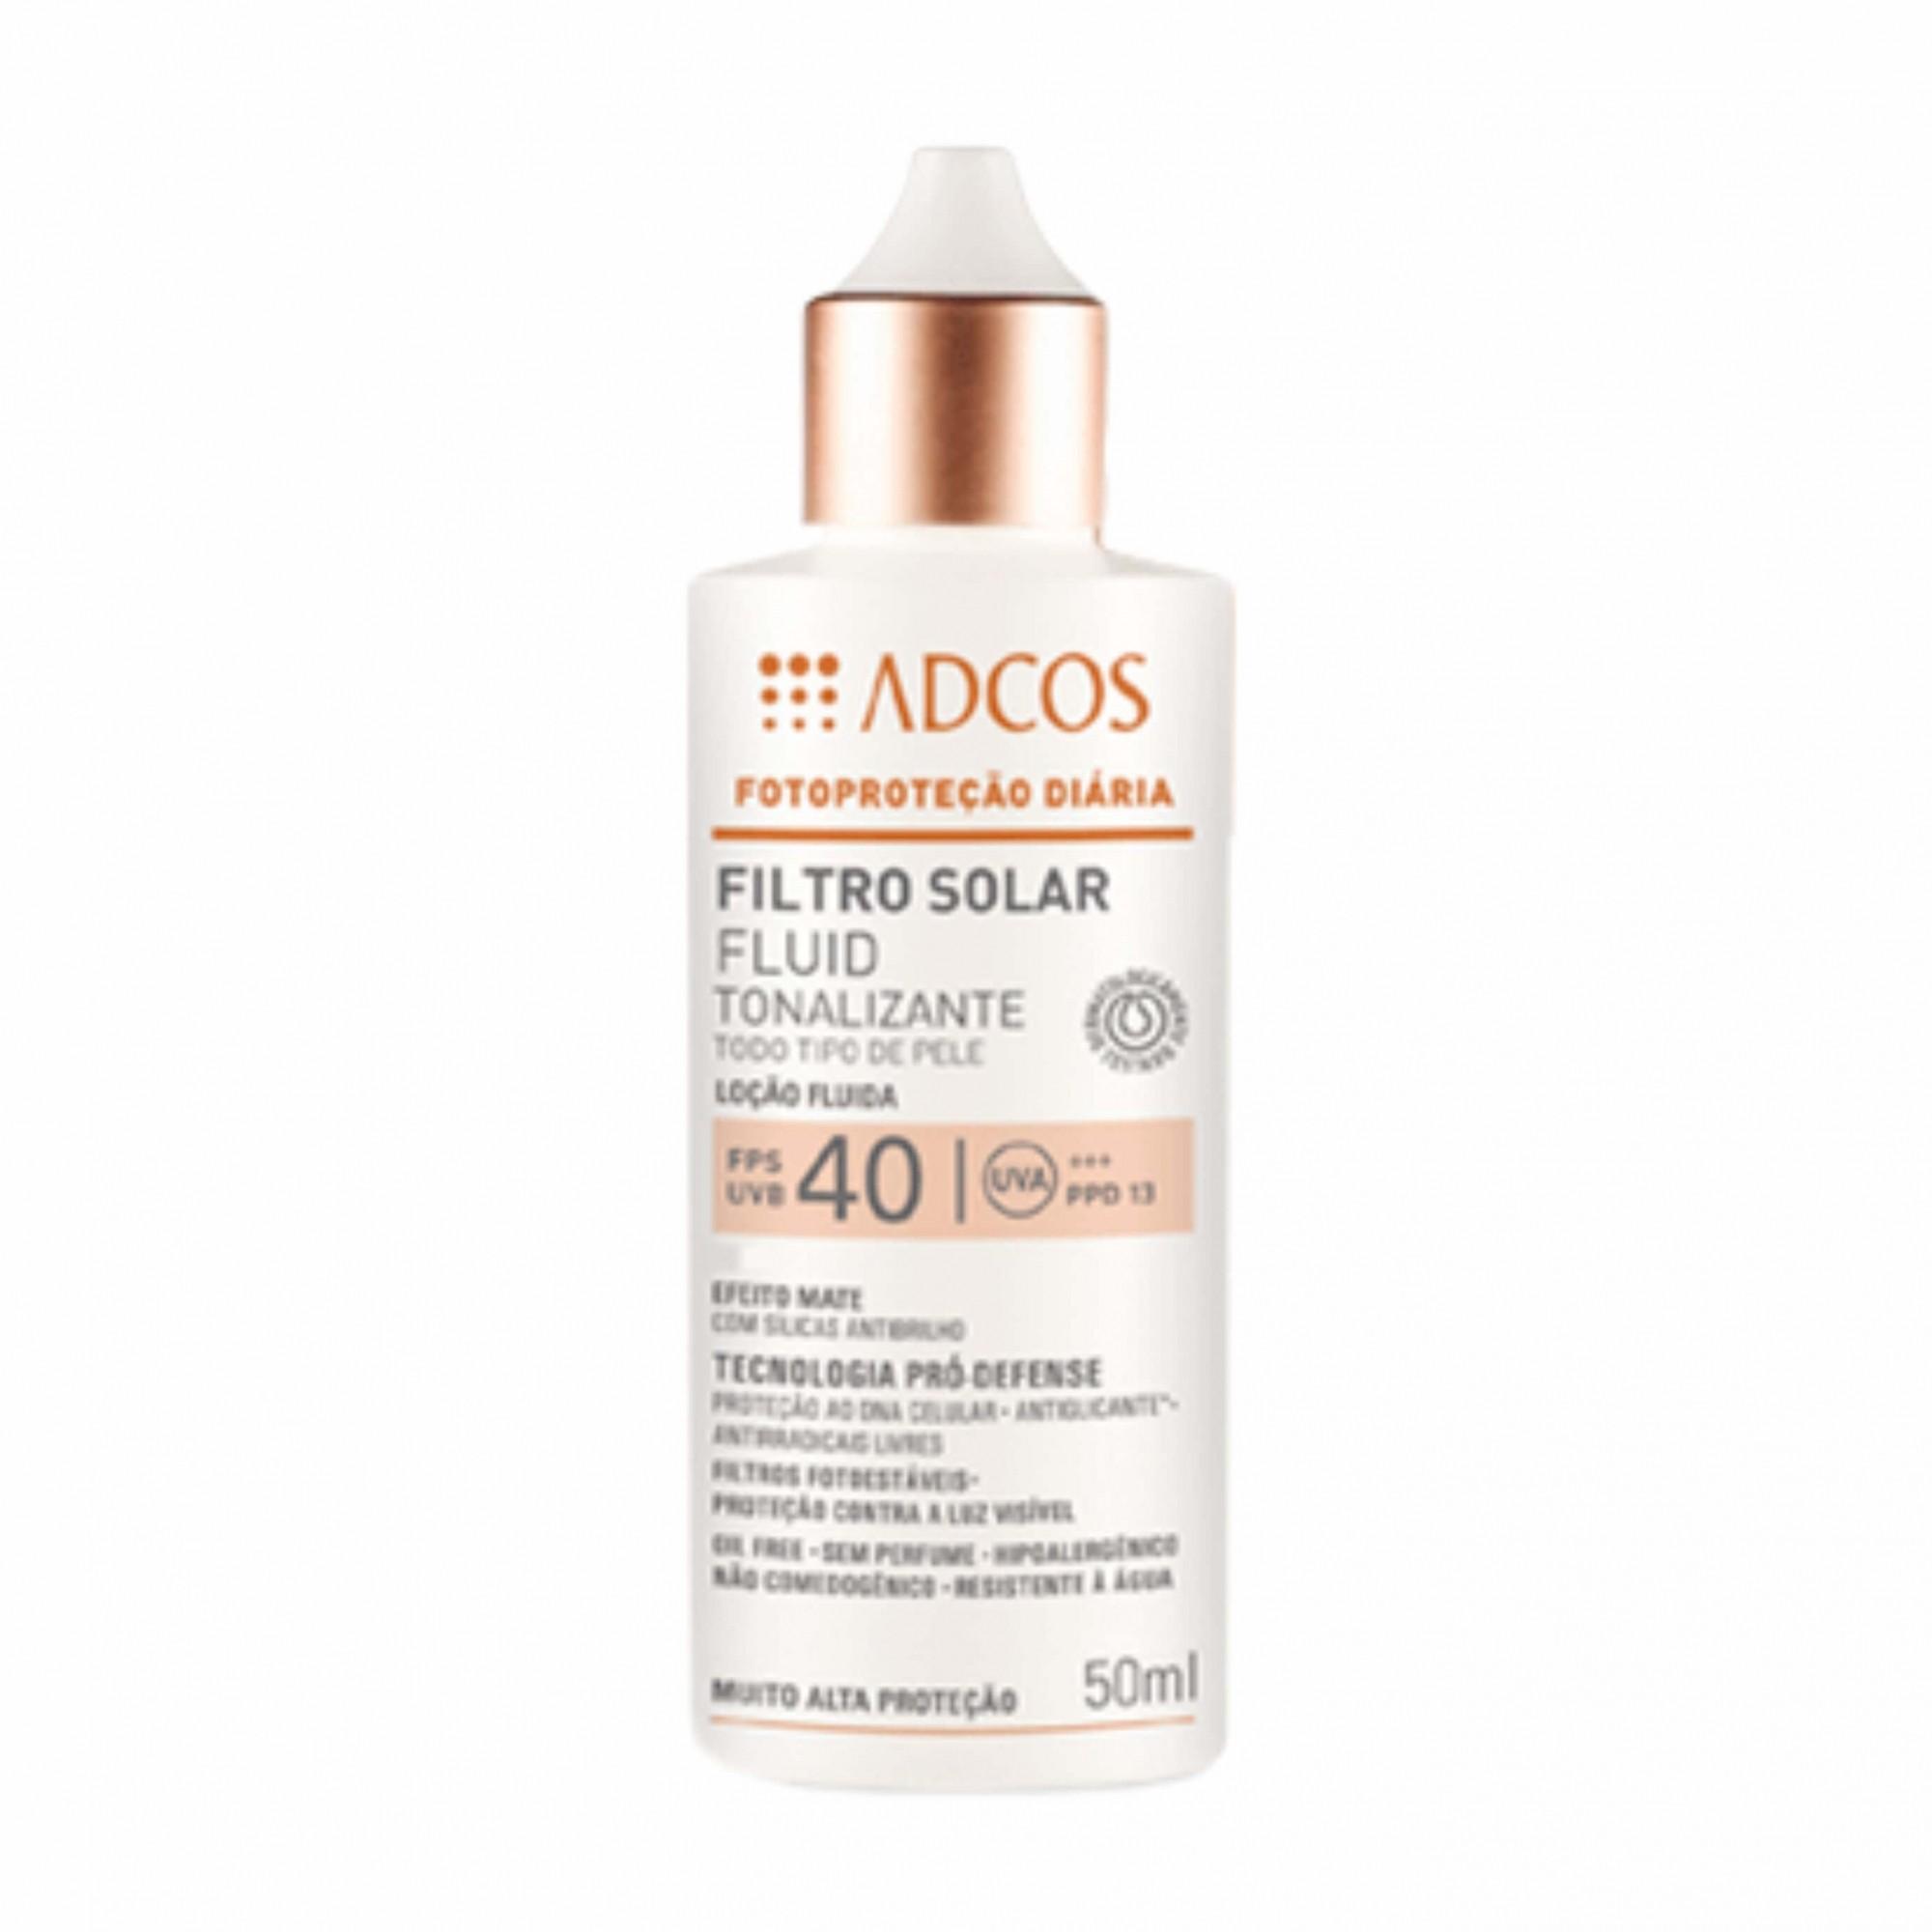 Filtro Solar Tonalizante ADCOS FPS 40 Fluid - Peach